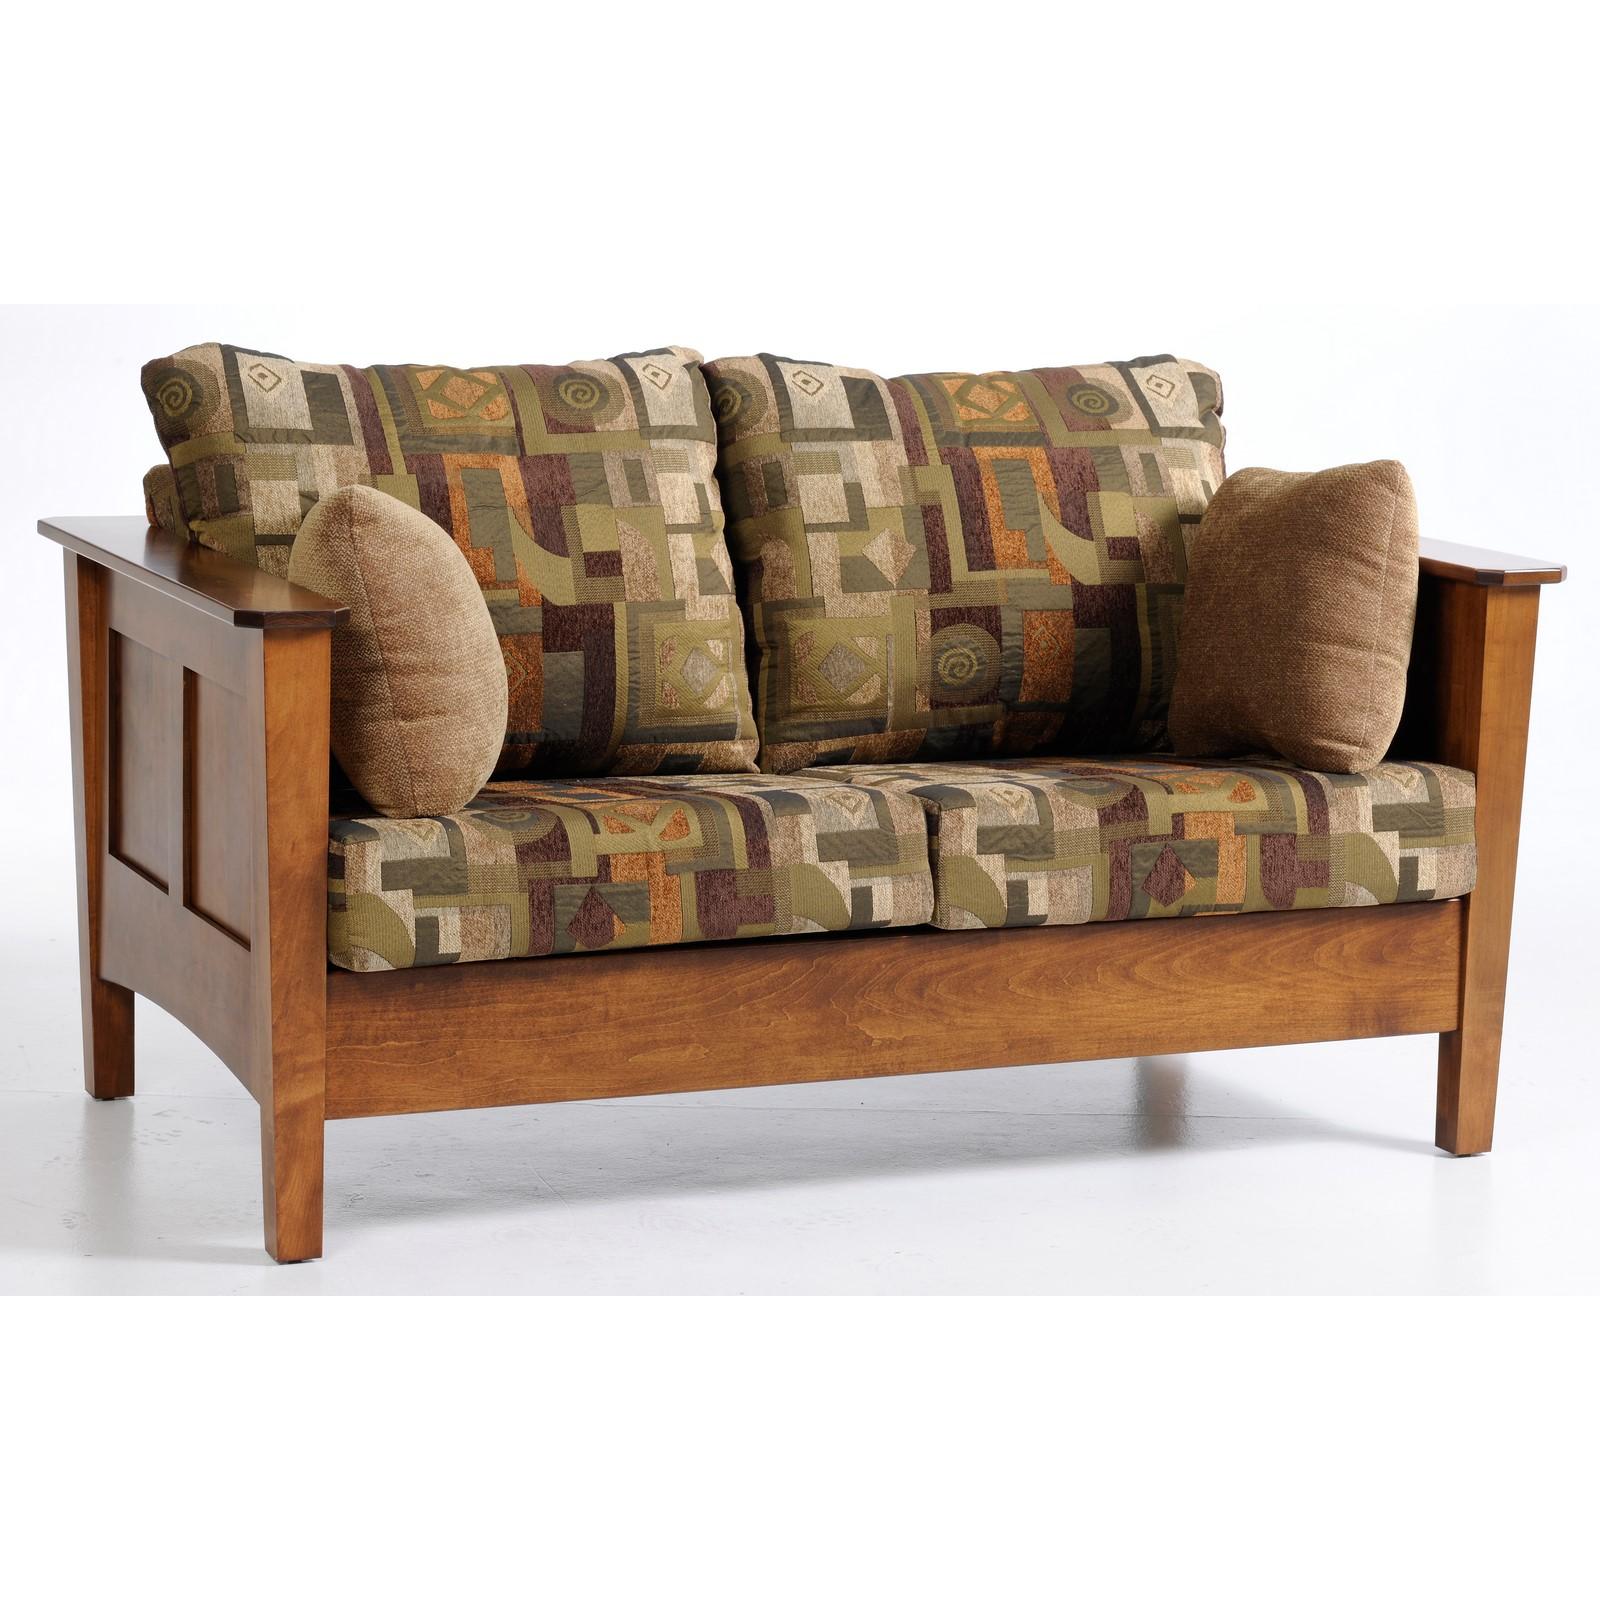 Y Amp T Urban Shaker 5001 Loveseat Stewart Roth Furniture